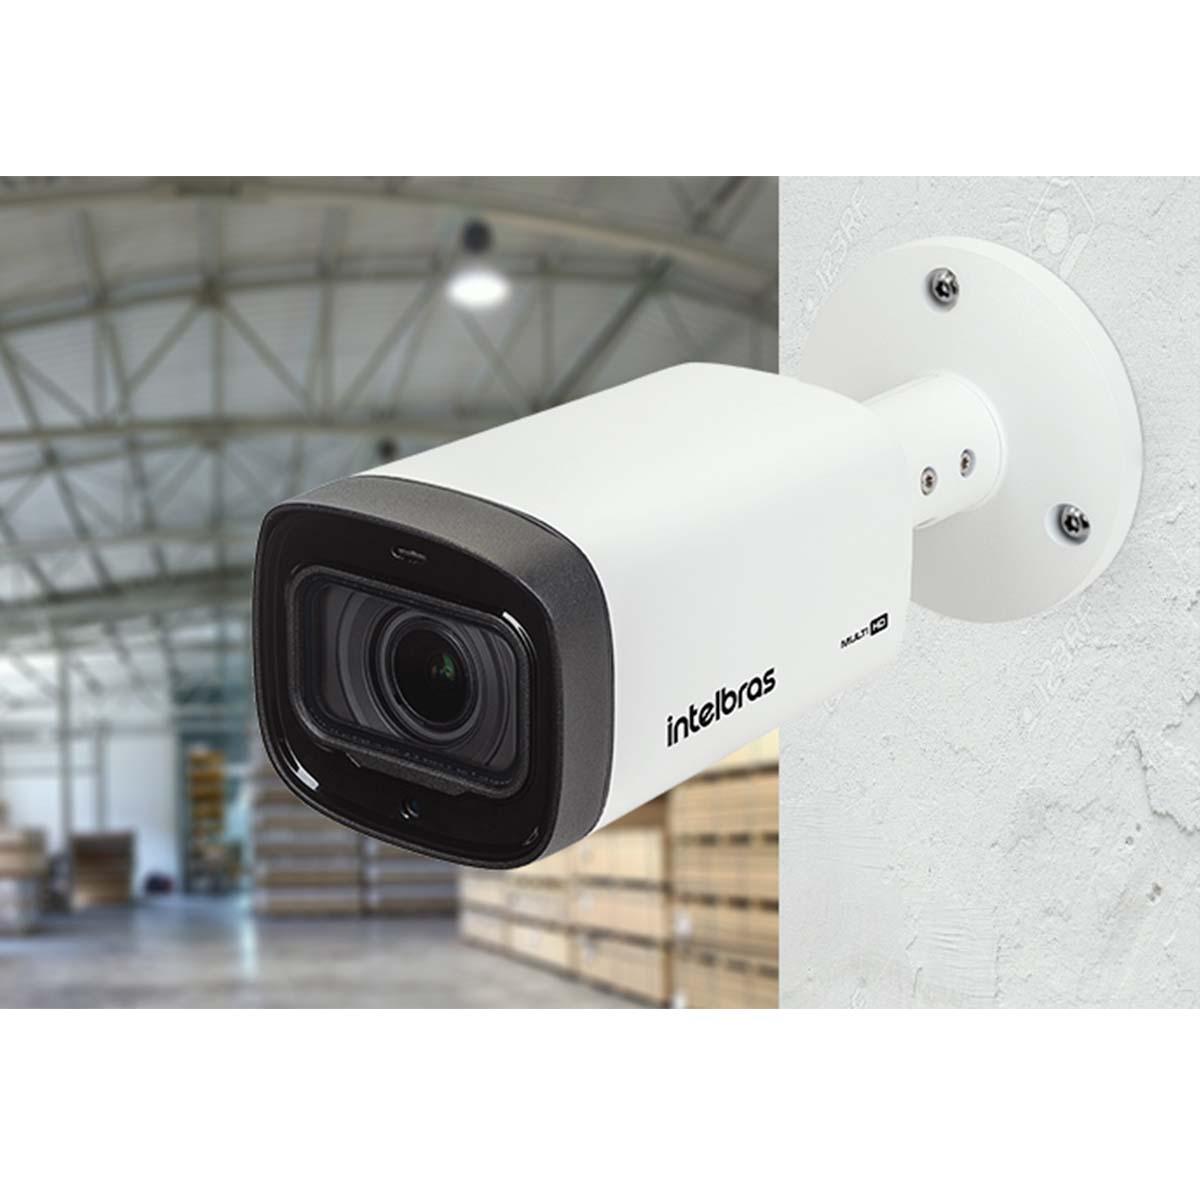 Câmera Bullet Intelbras Vhd 3240 Vf G6 1080p 2.7 A 12mm